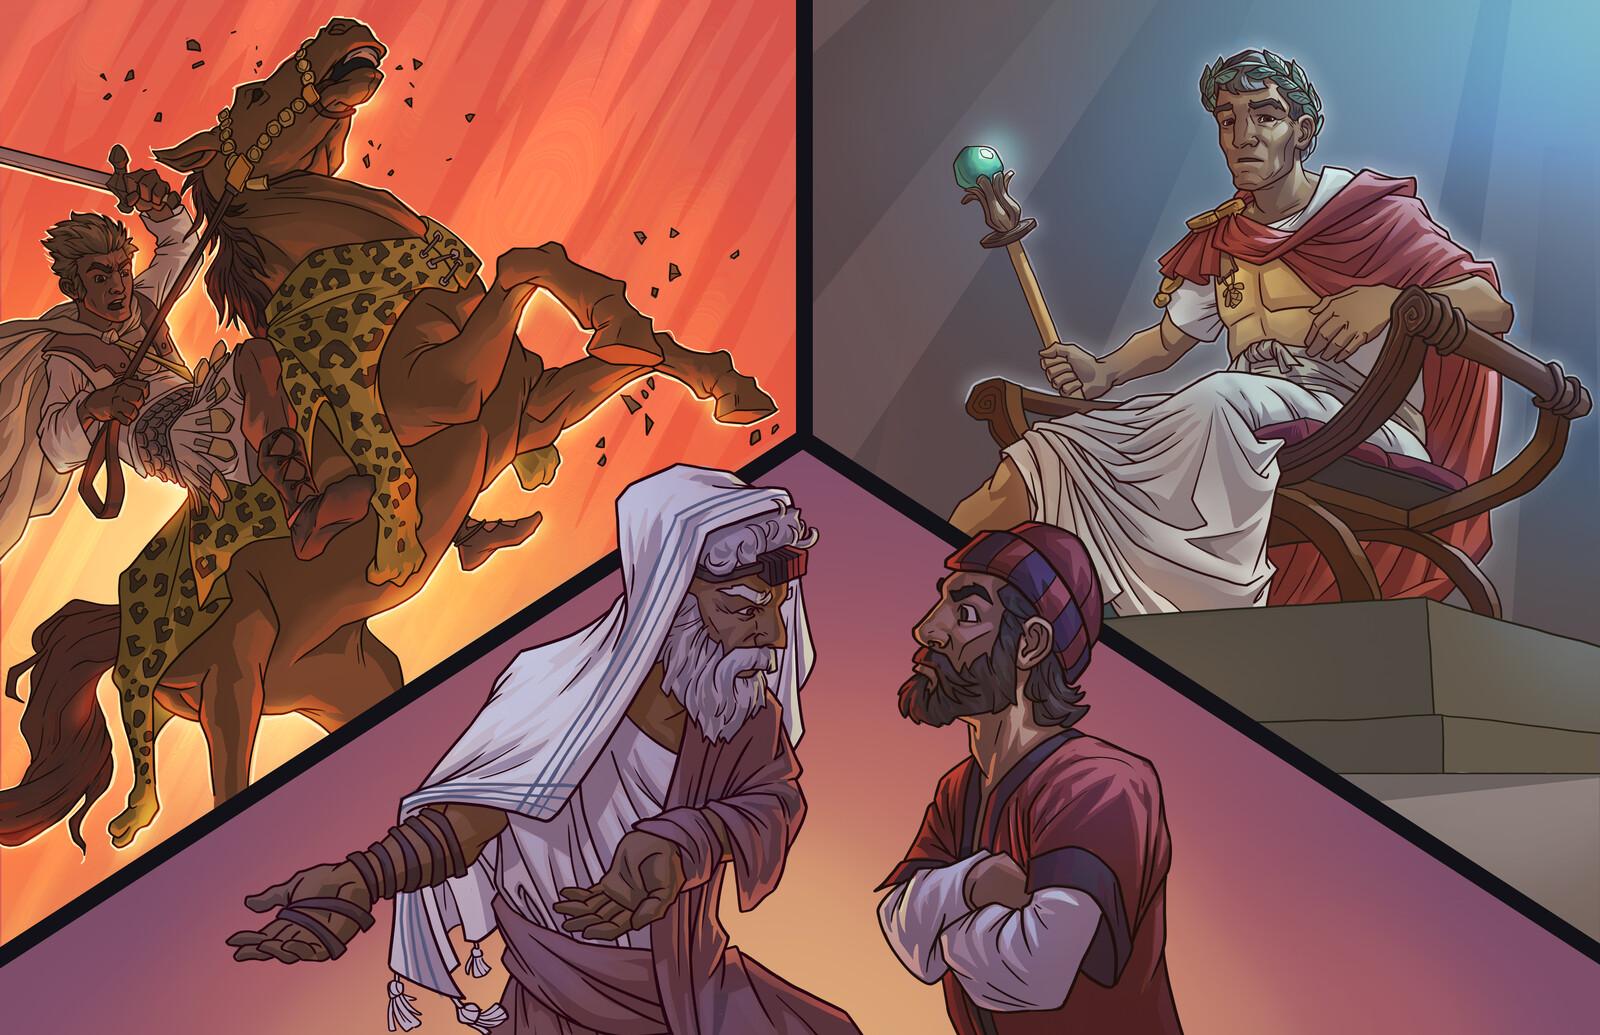 Alexander the Great, Caesar, and a Pharisee and Sadducee